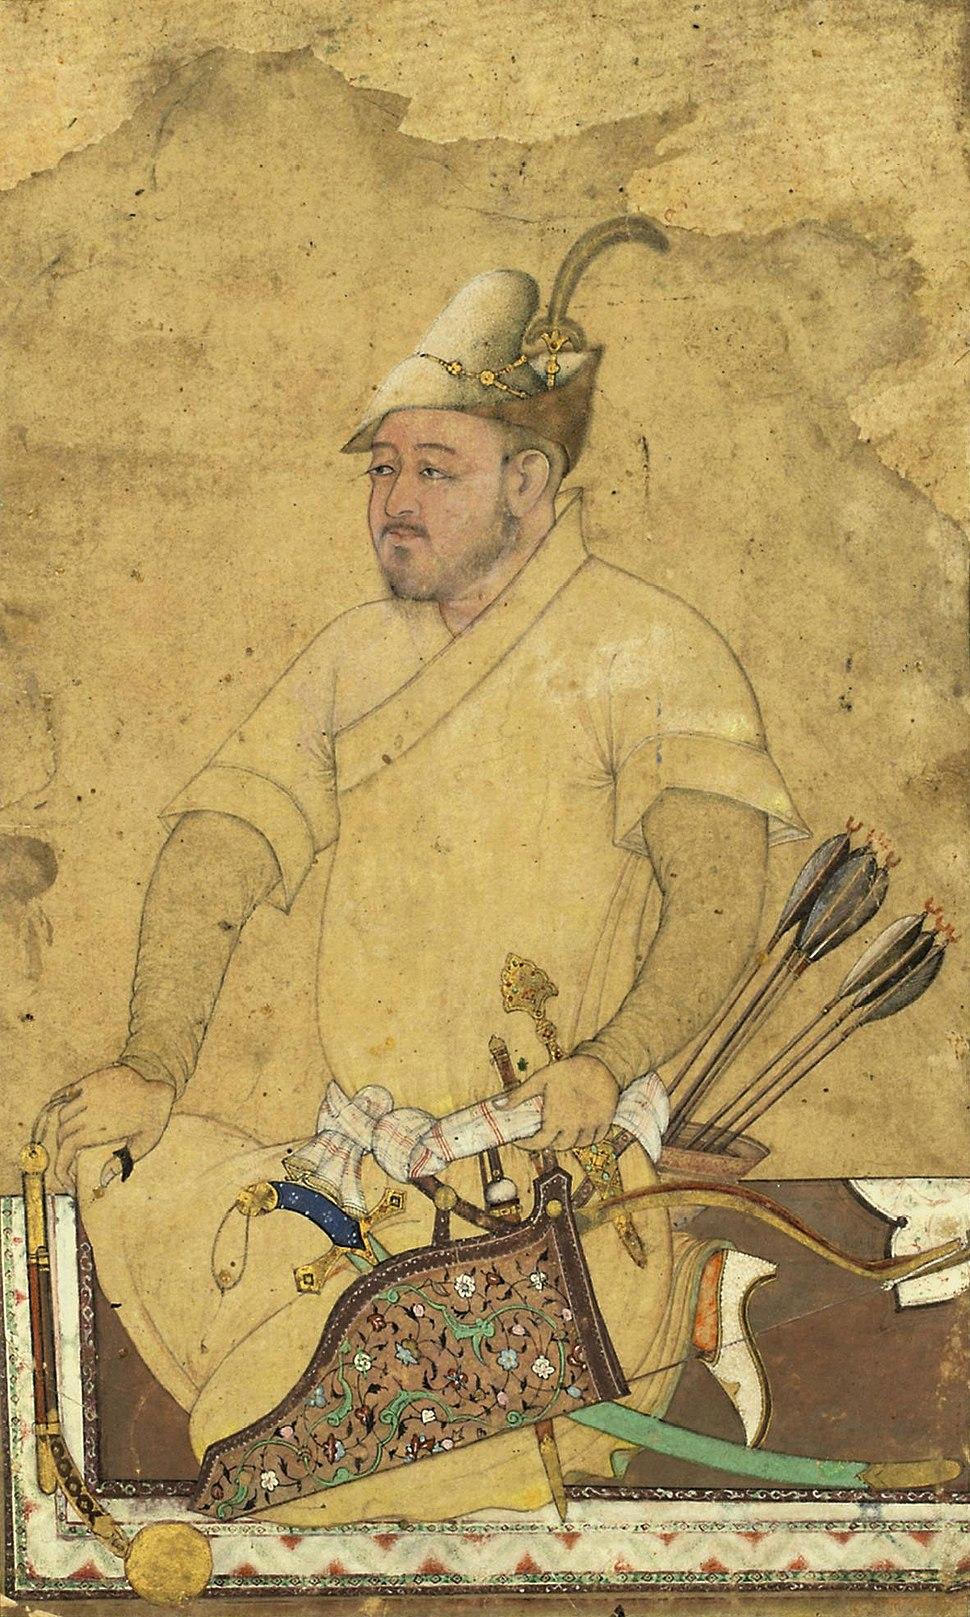 A heavily armed Uzbek, Safavid Iran, mid 16th century